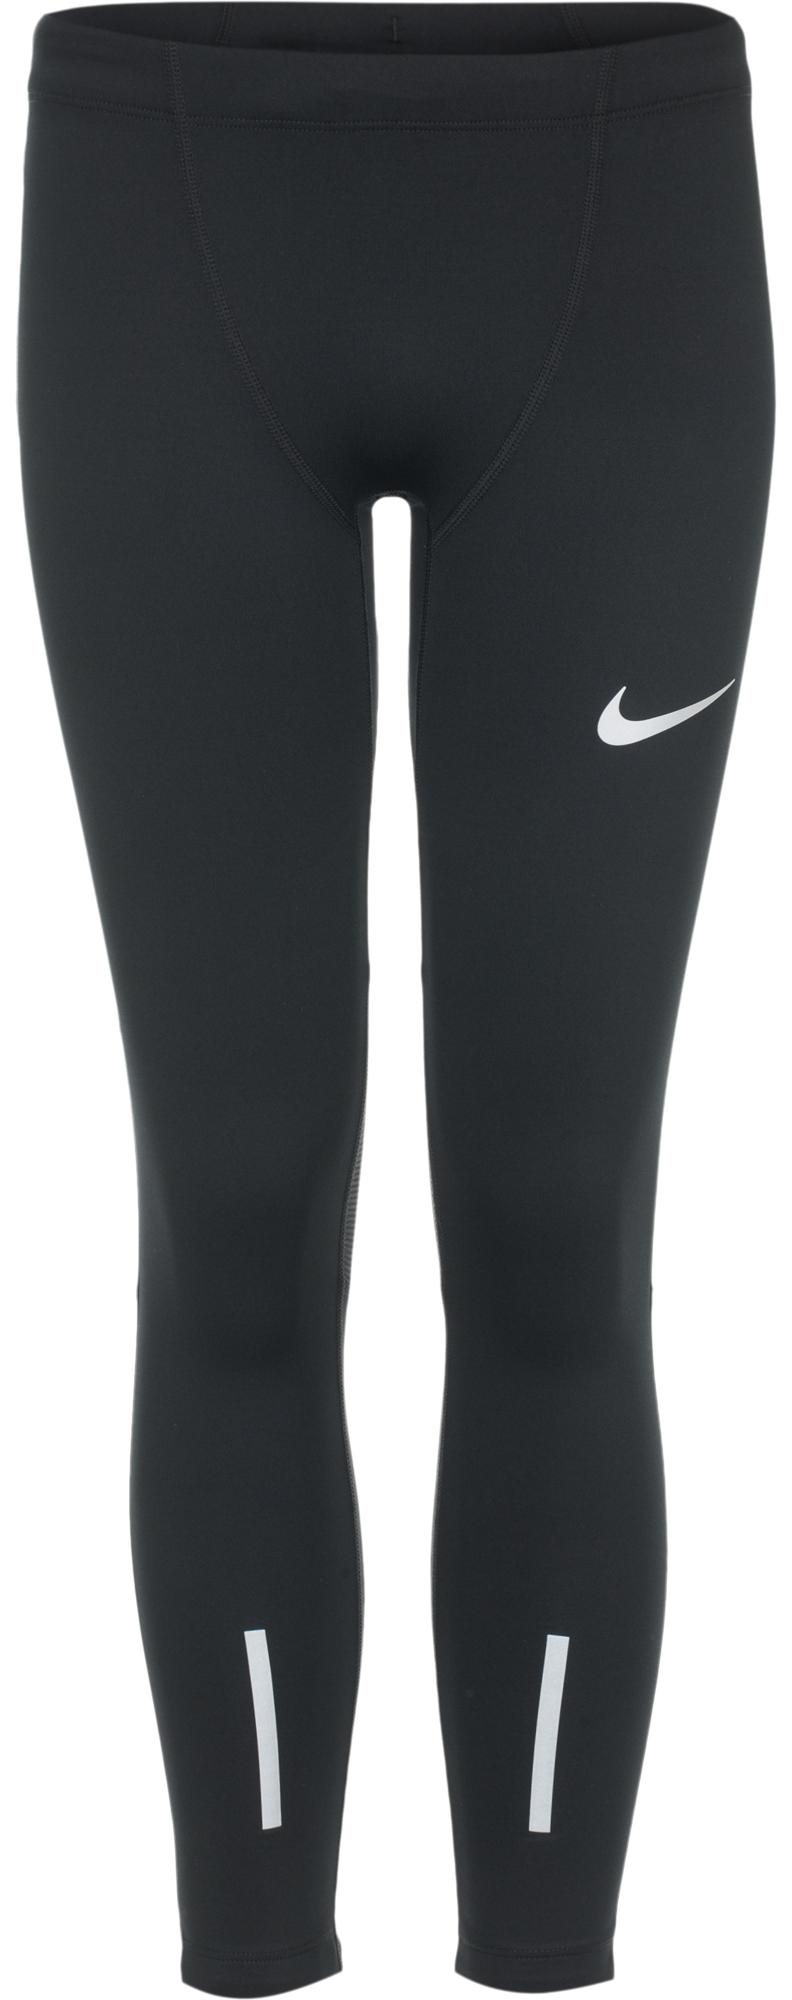 Nike Легинсы для мальчиков Nike Power